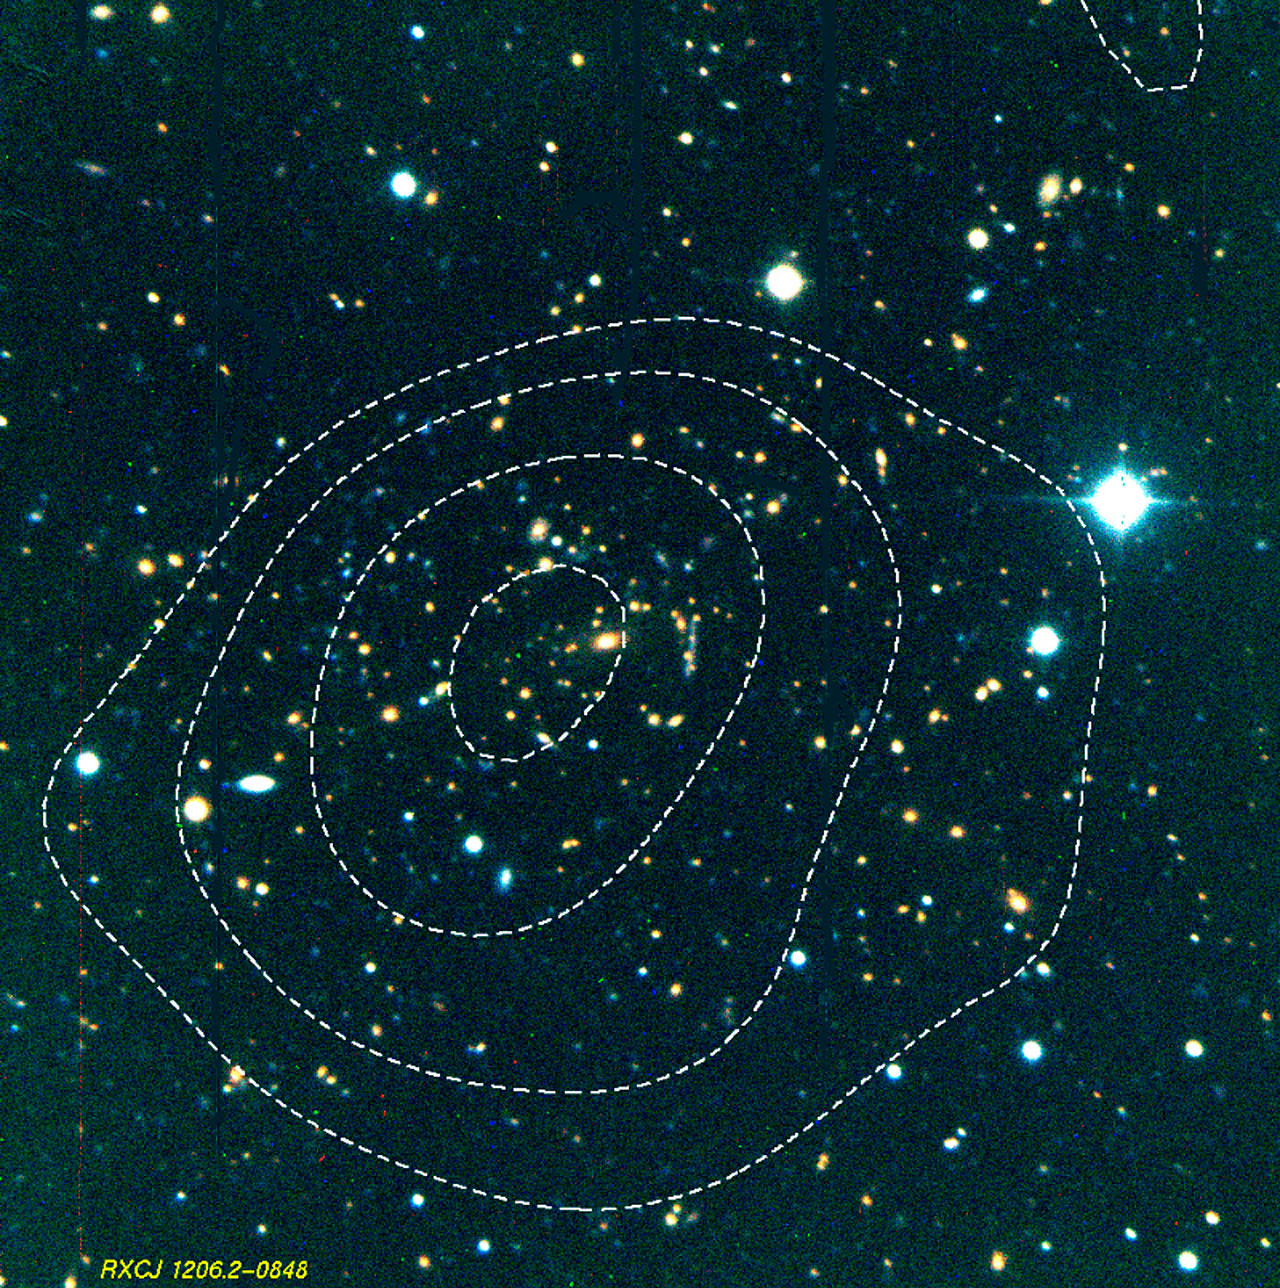 Massive Cluster of Galaxies RXCJ1206.2-0848